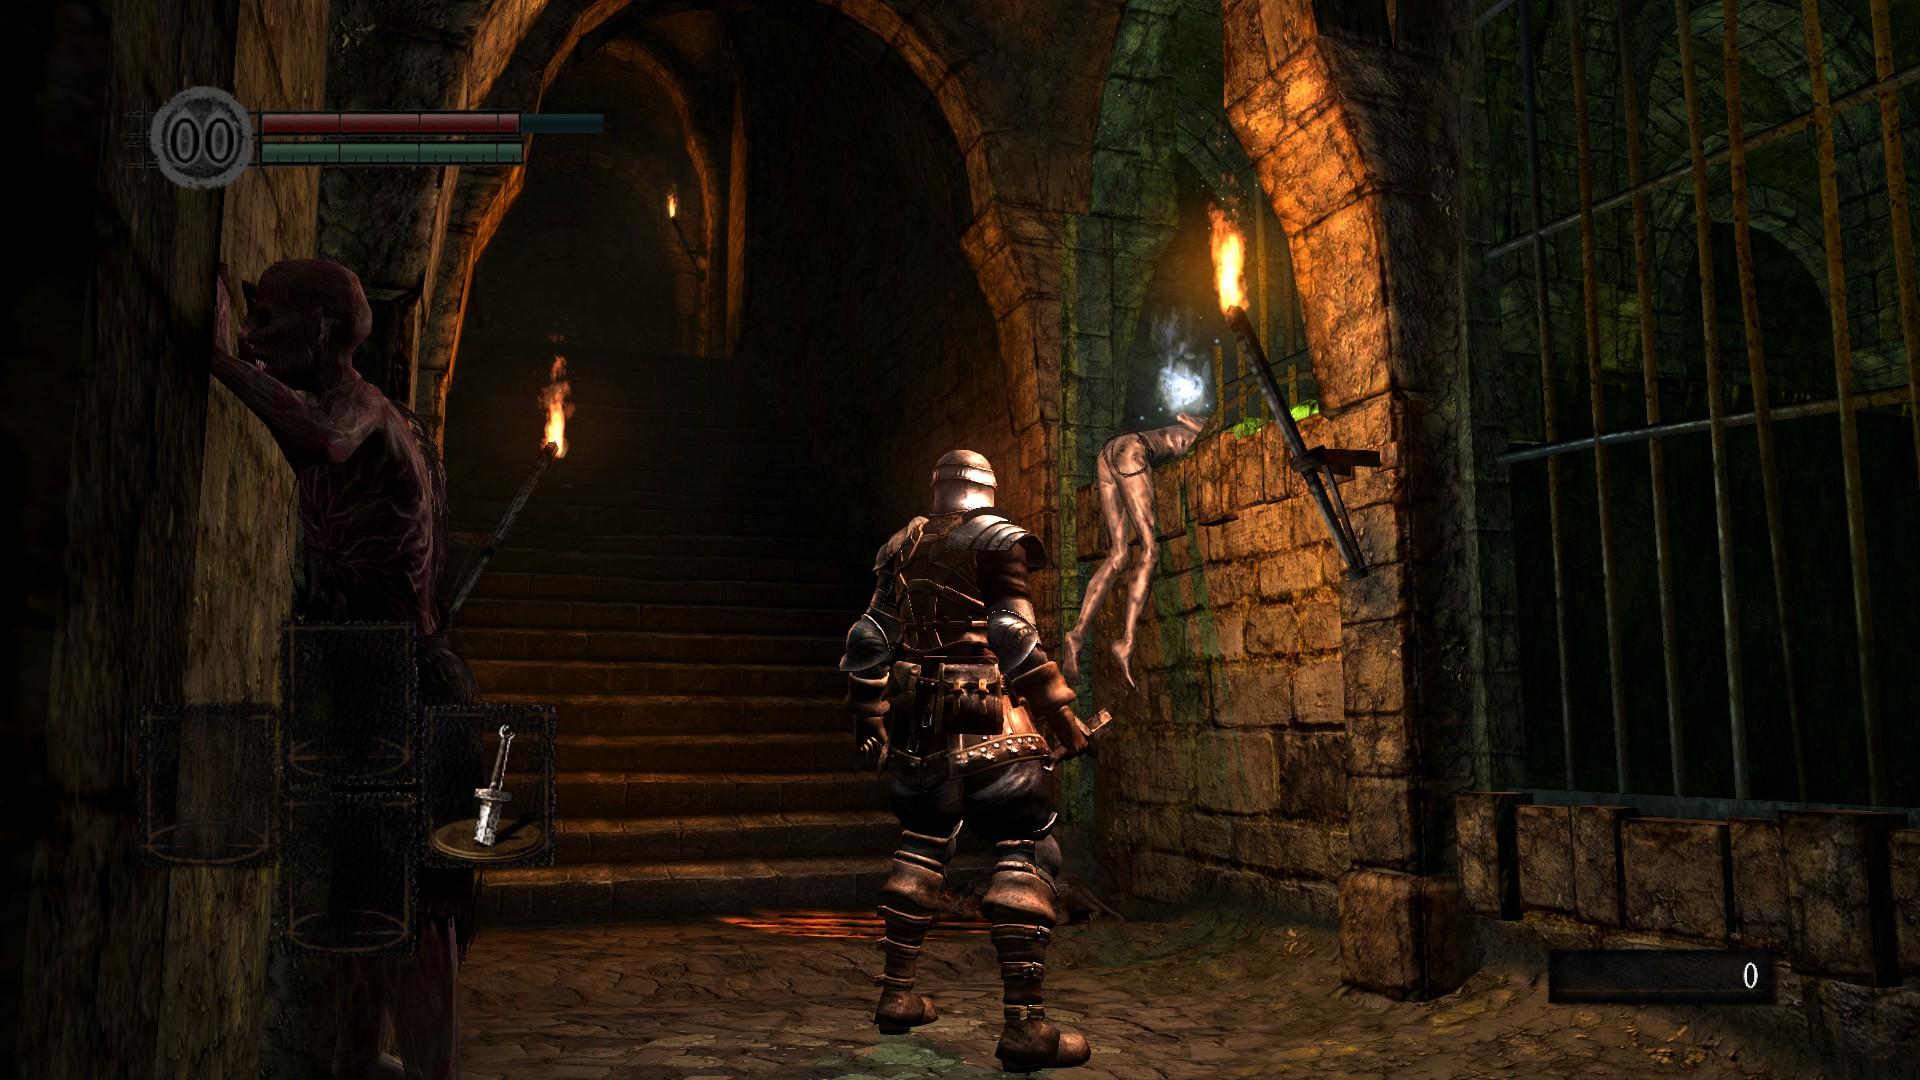 Dark Souls: Daughters of Ash nos propone redescubrir Lordran